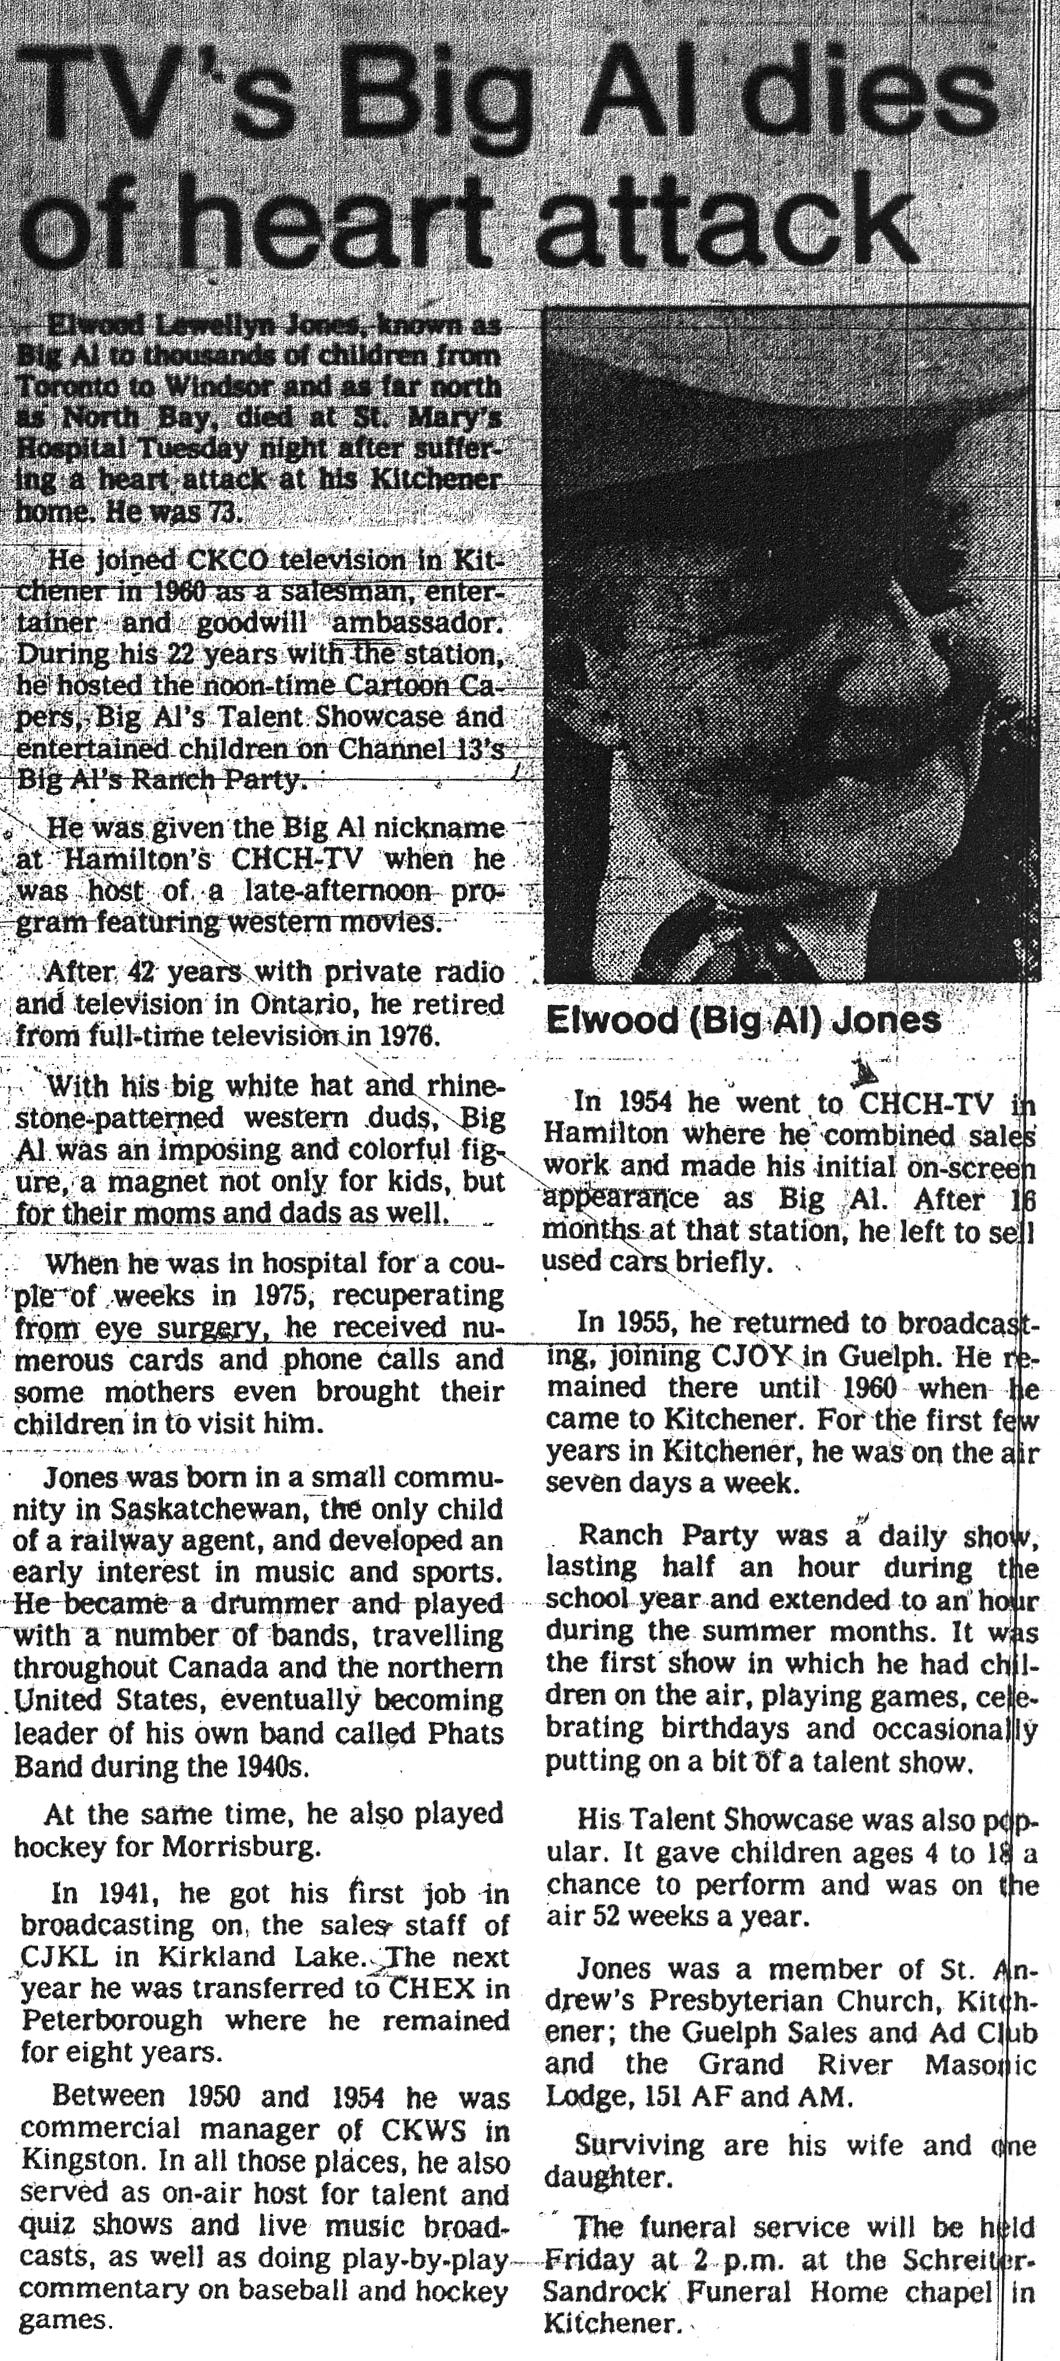 Jones, Elwood L. - March 28, 1984 - Story